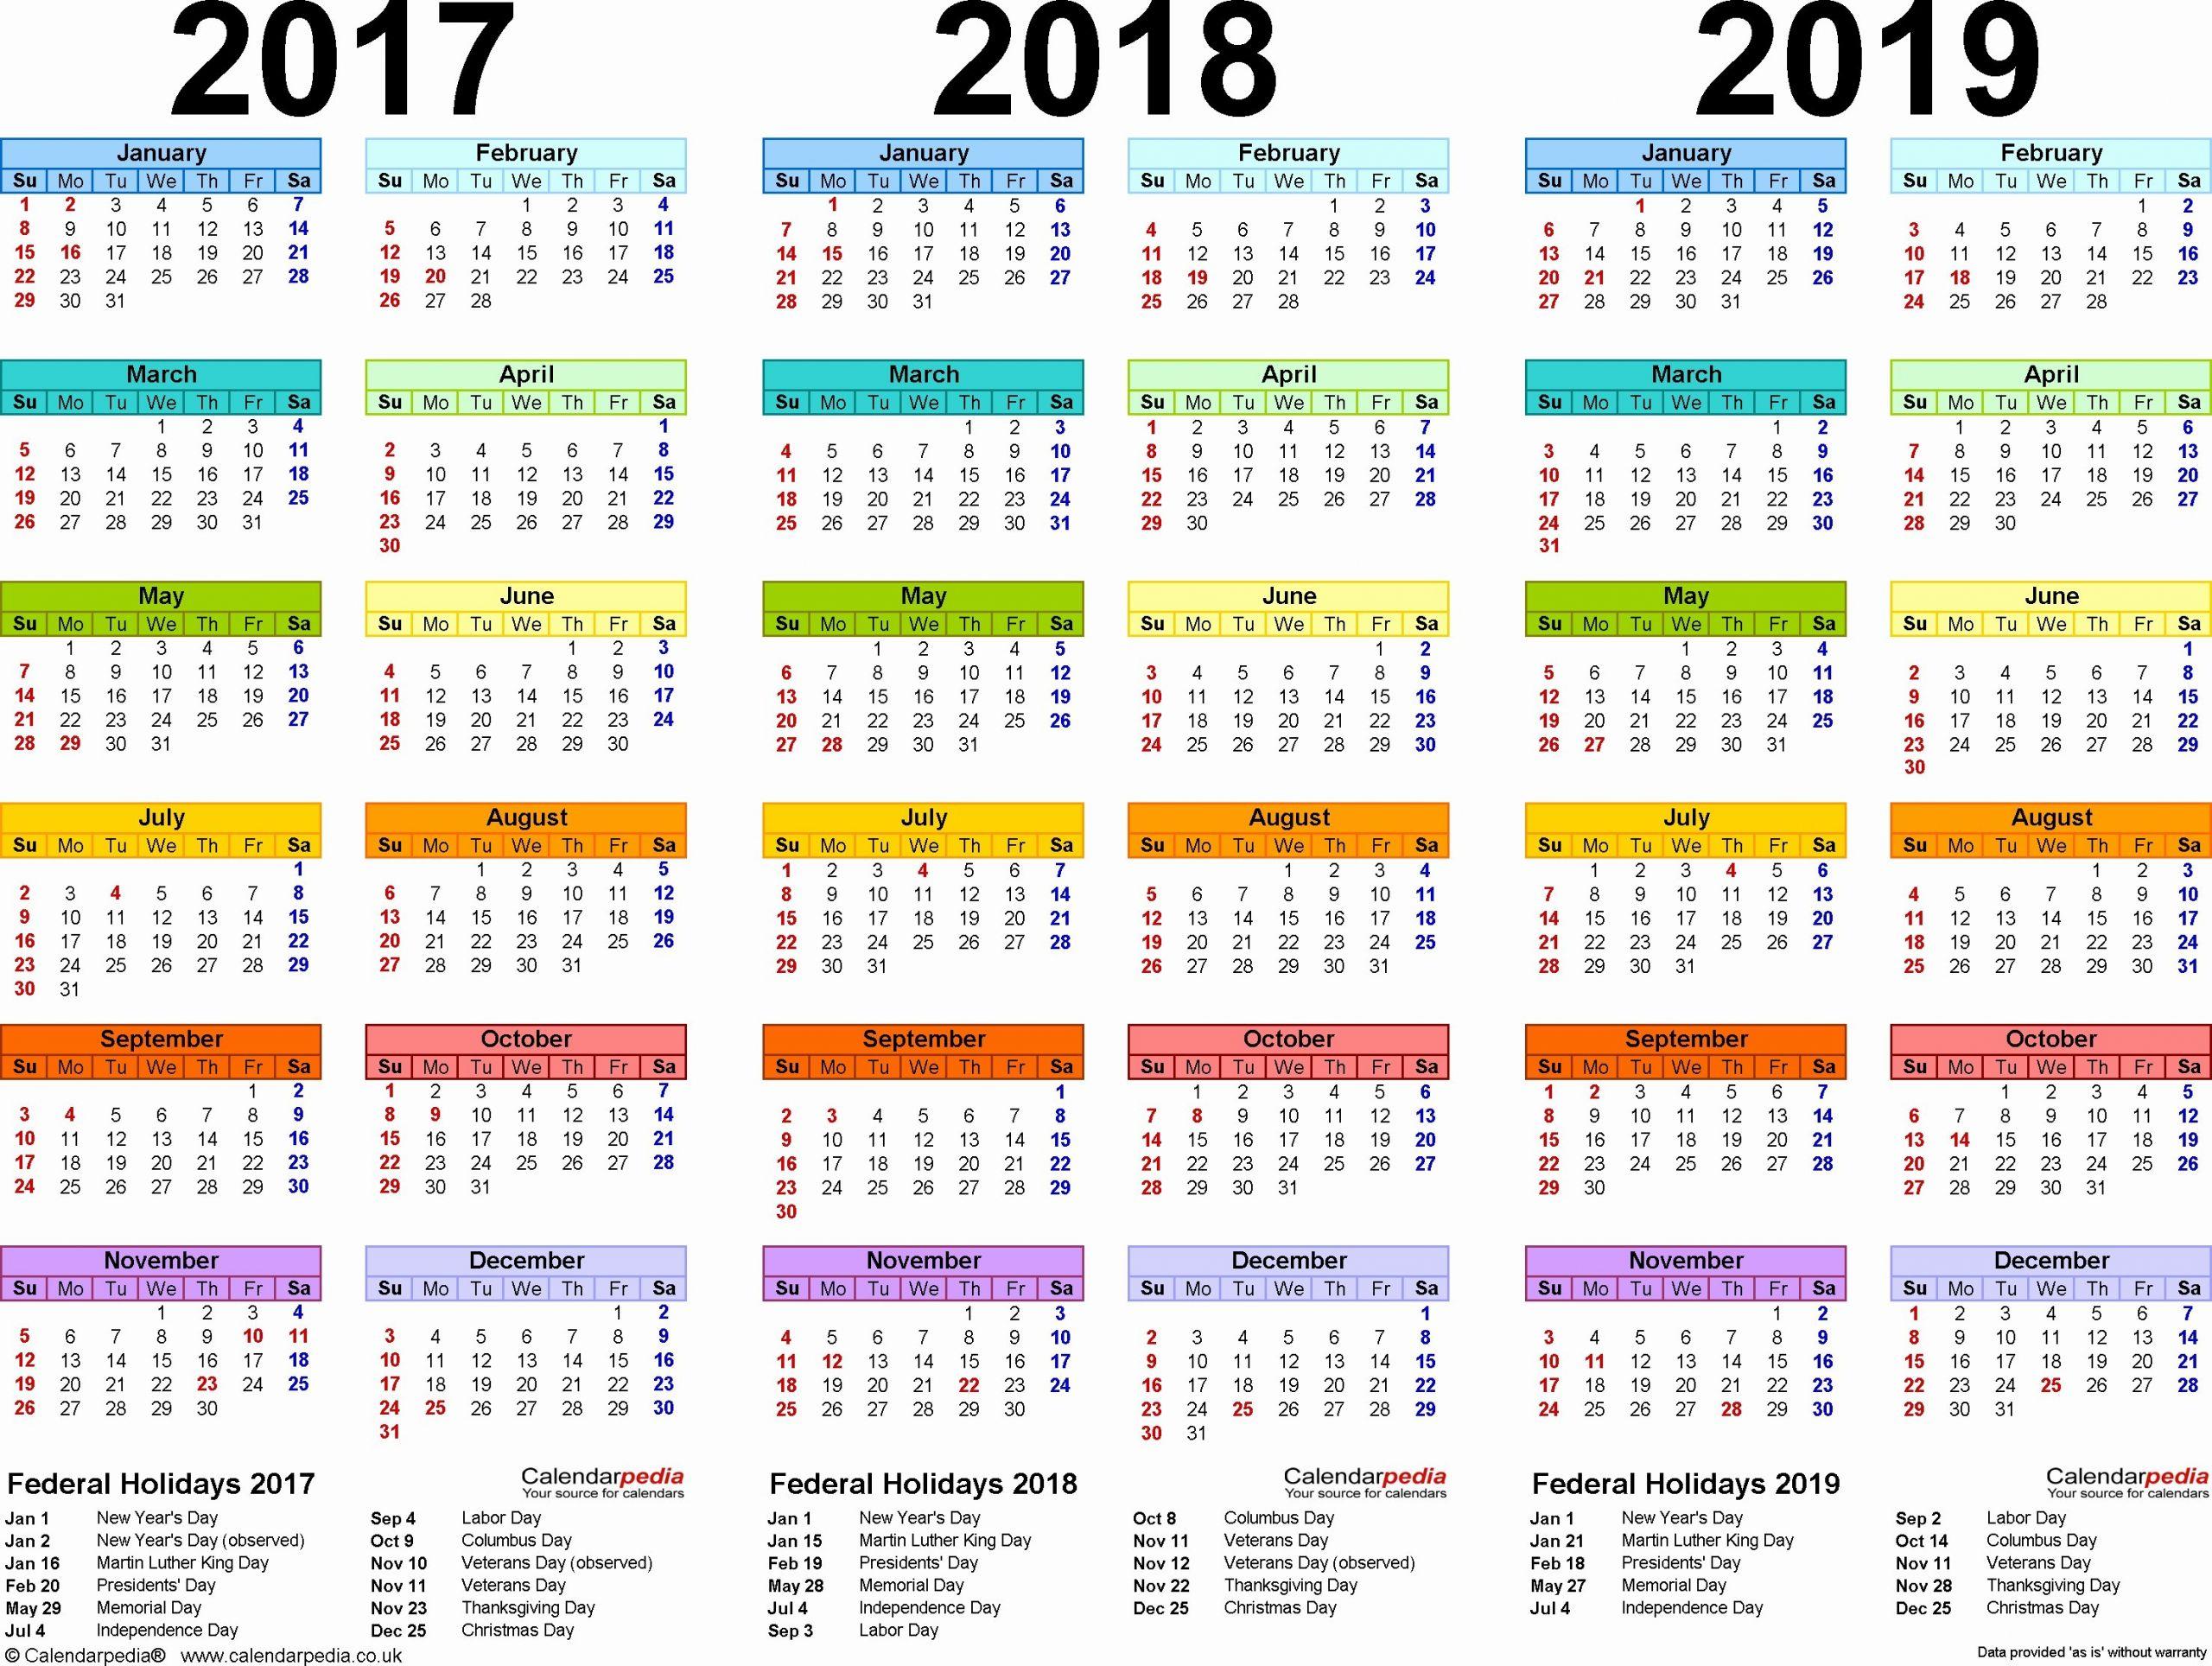 kalender 2019 pdf ferien mas recientes calendrier bayern 2019 calendar uk 2018 calendar printable of kalender 2019 pdf ferien